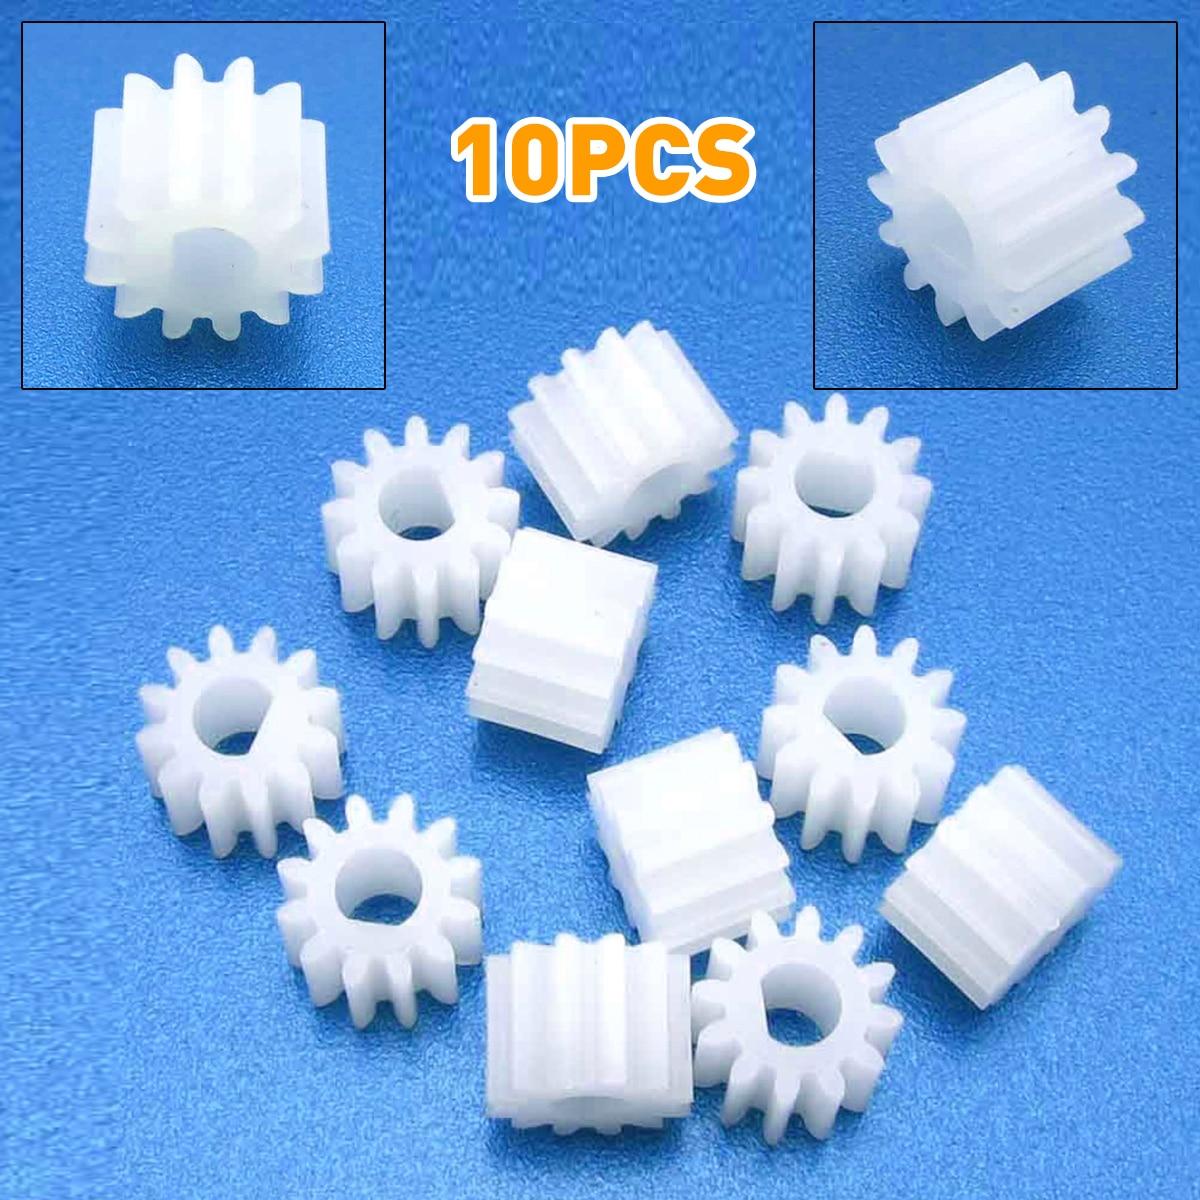 10pcs NEW Plastic gear 3mm 12 teeth D hole gear motor gear Toy model DIY